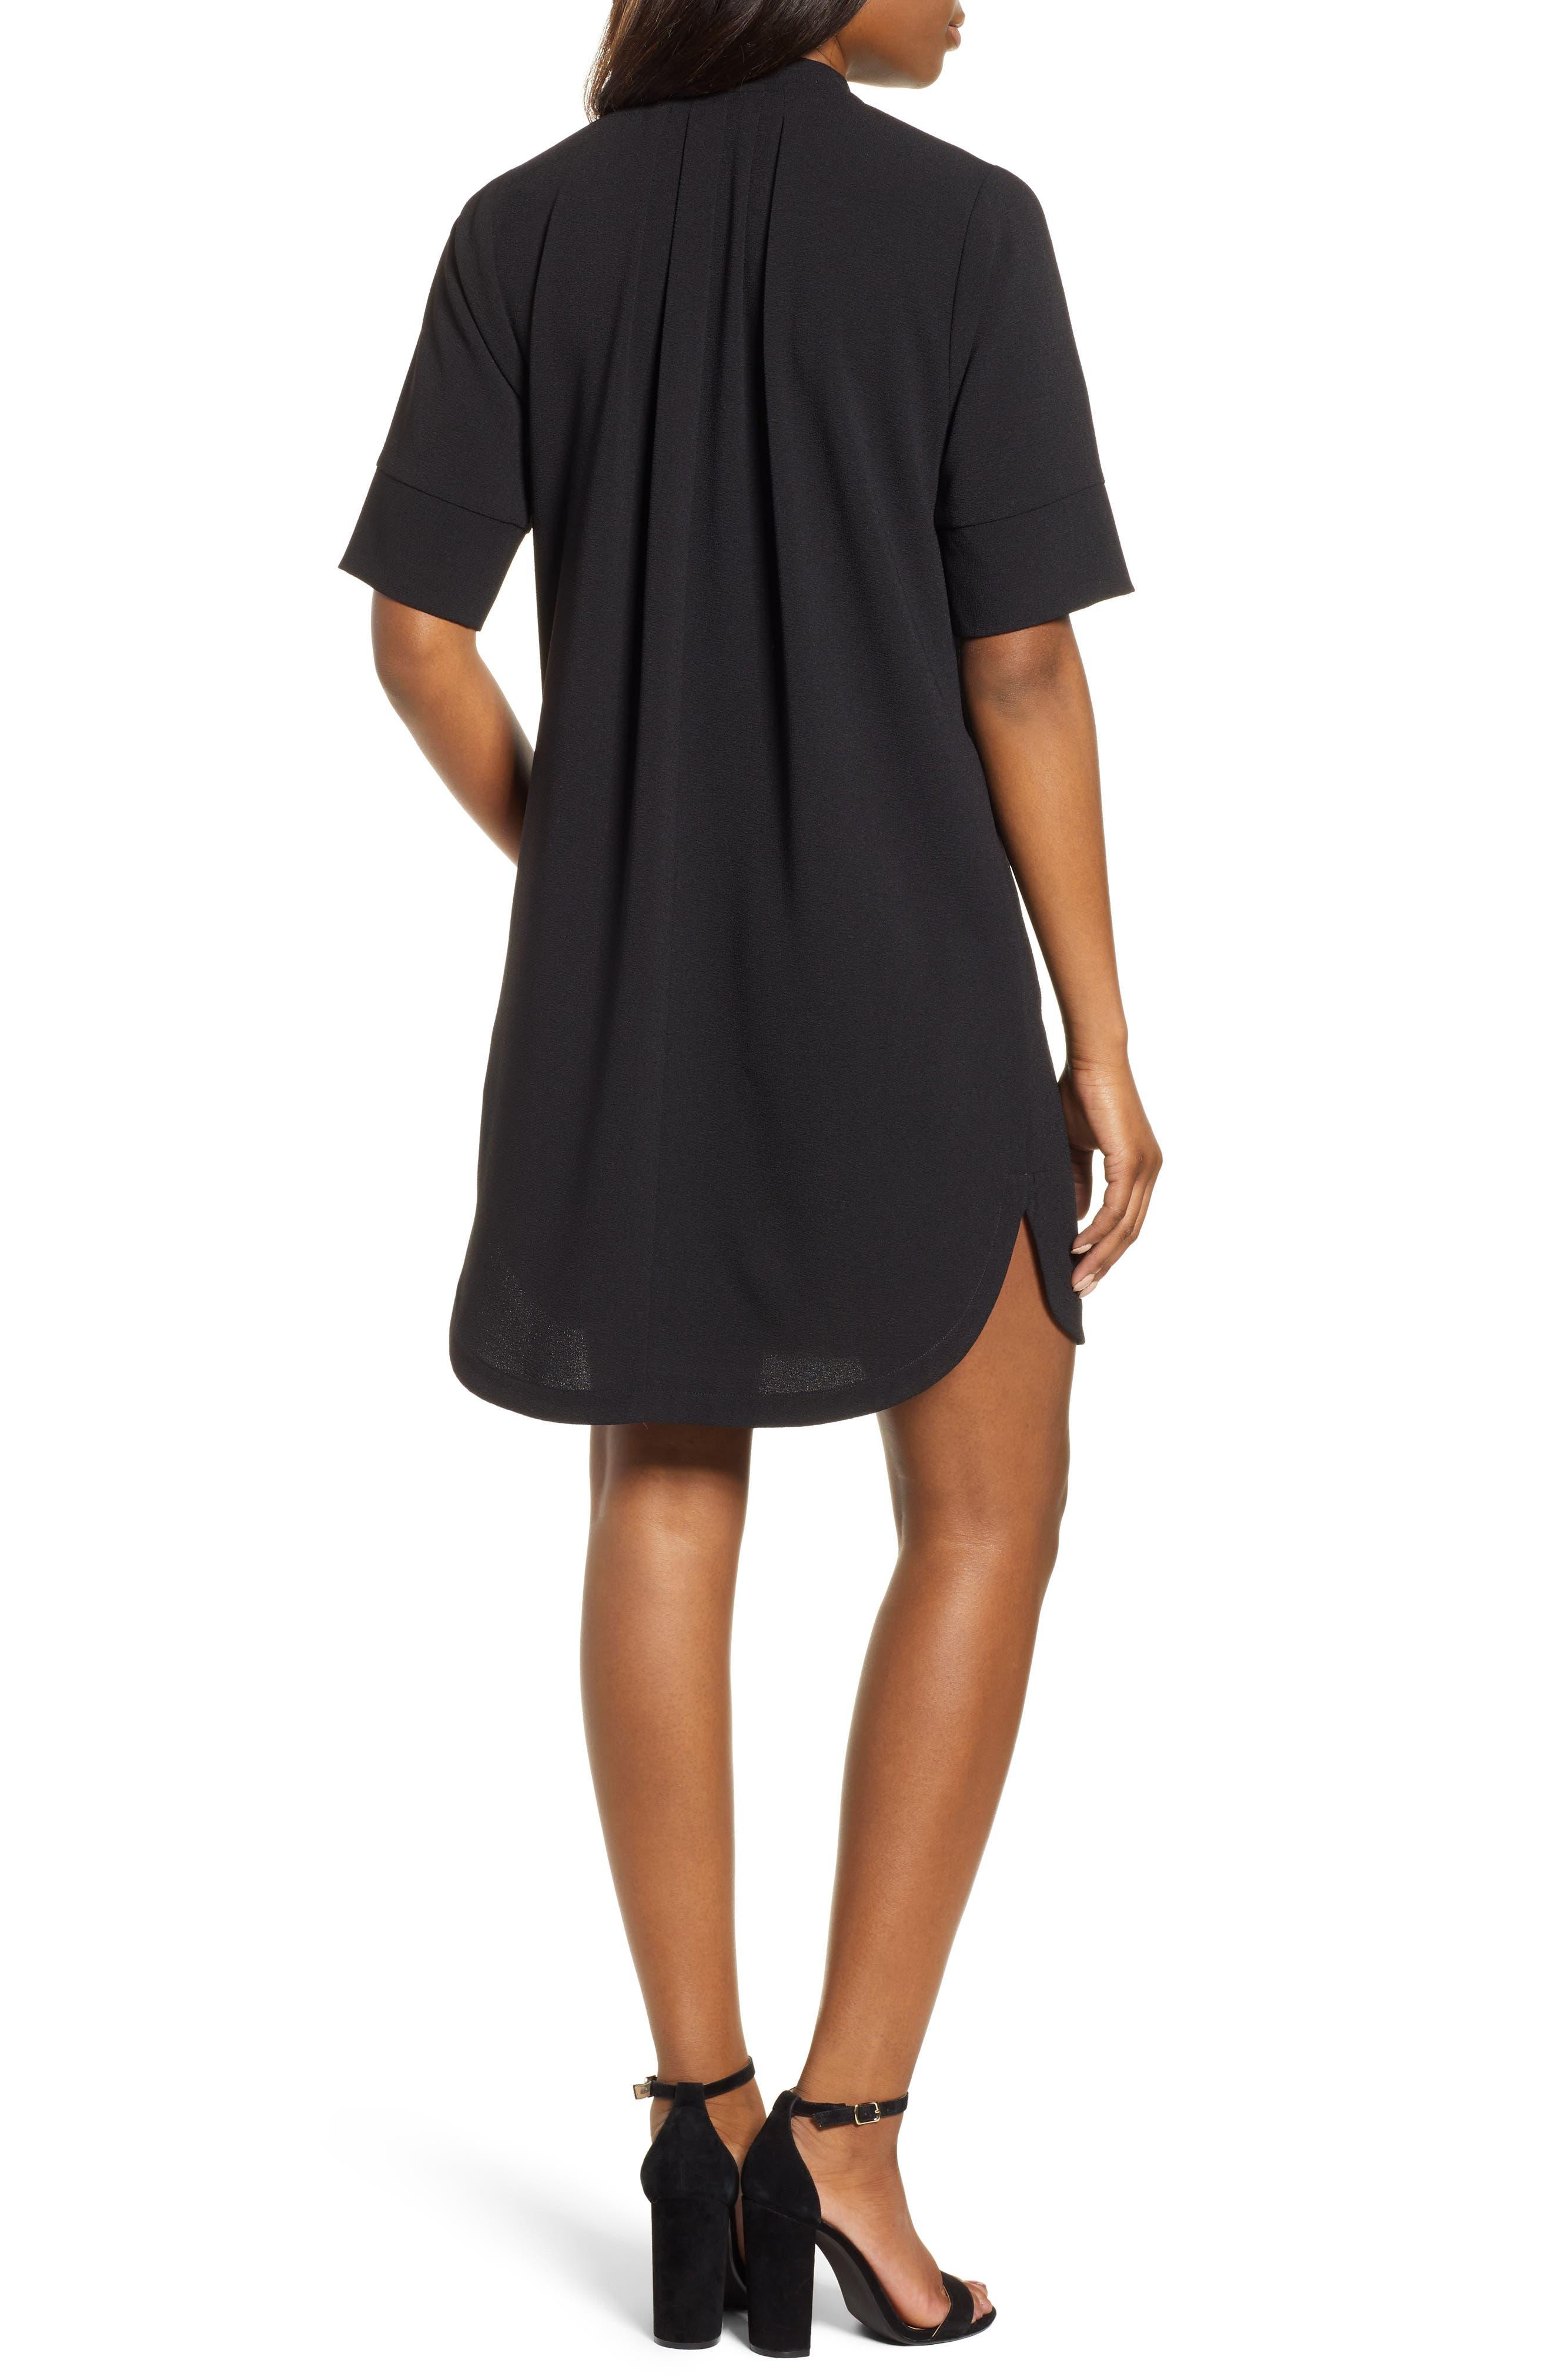 BOBEAU, Pleat Front Curved Hem Shirtdress, Alternate thumbnail 2, color, BLACK